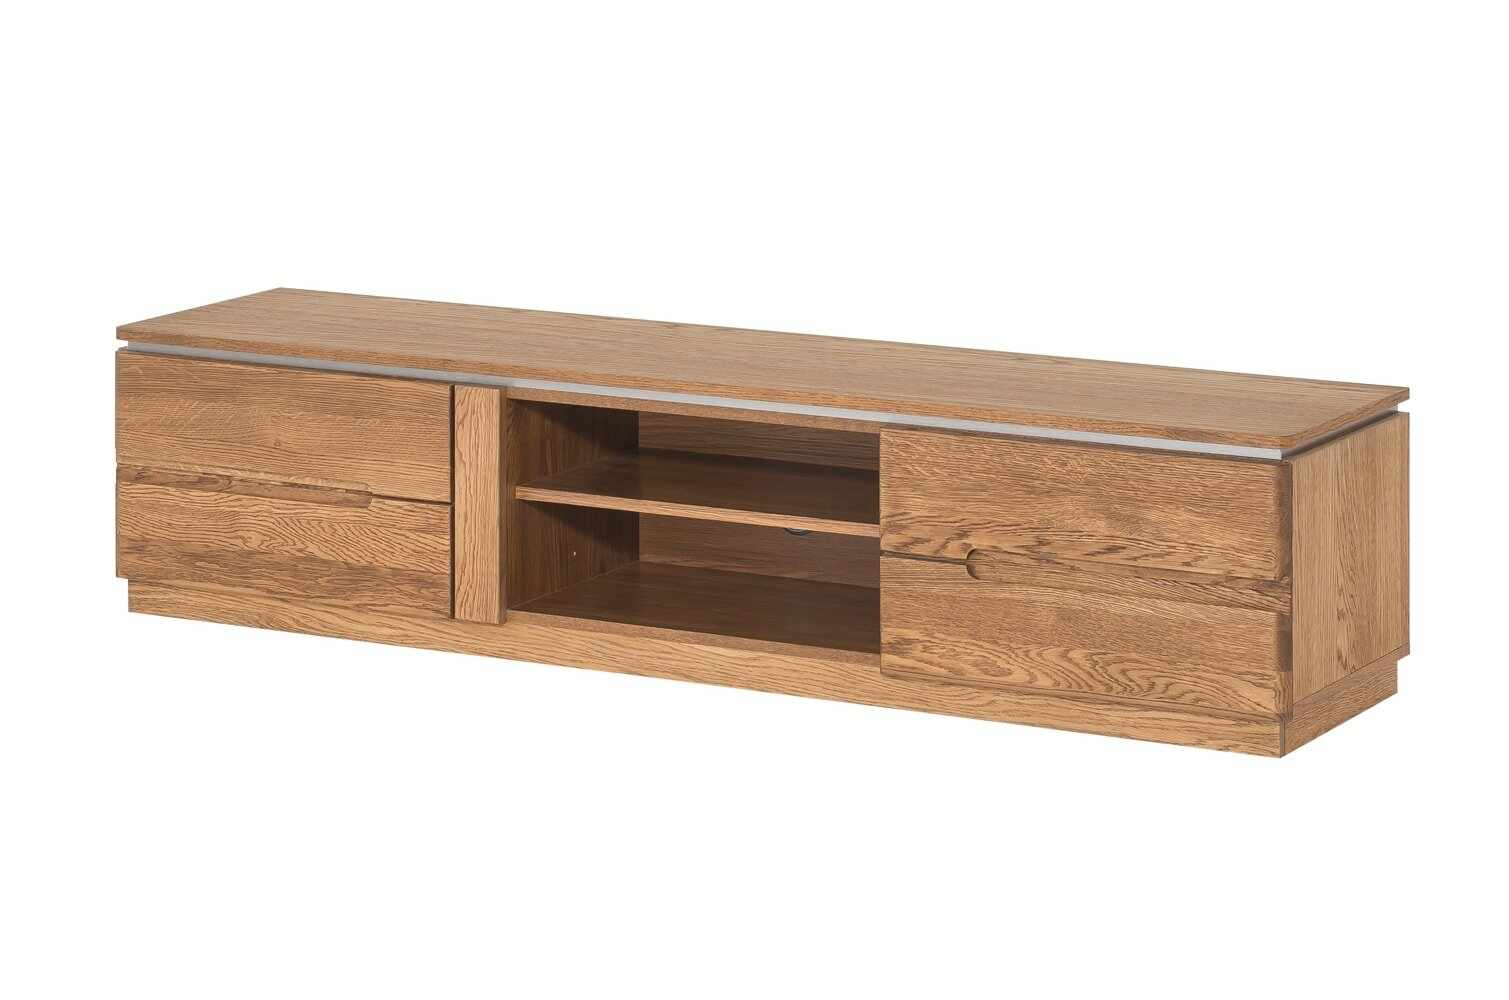 Comoda TV din lemn si furnir, cu 2 usi Montenegro 25 Medium Stejar Rustic, l163xA42xH38 cm la pret 1488 lei